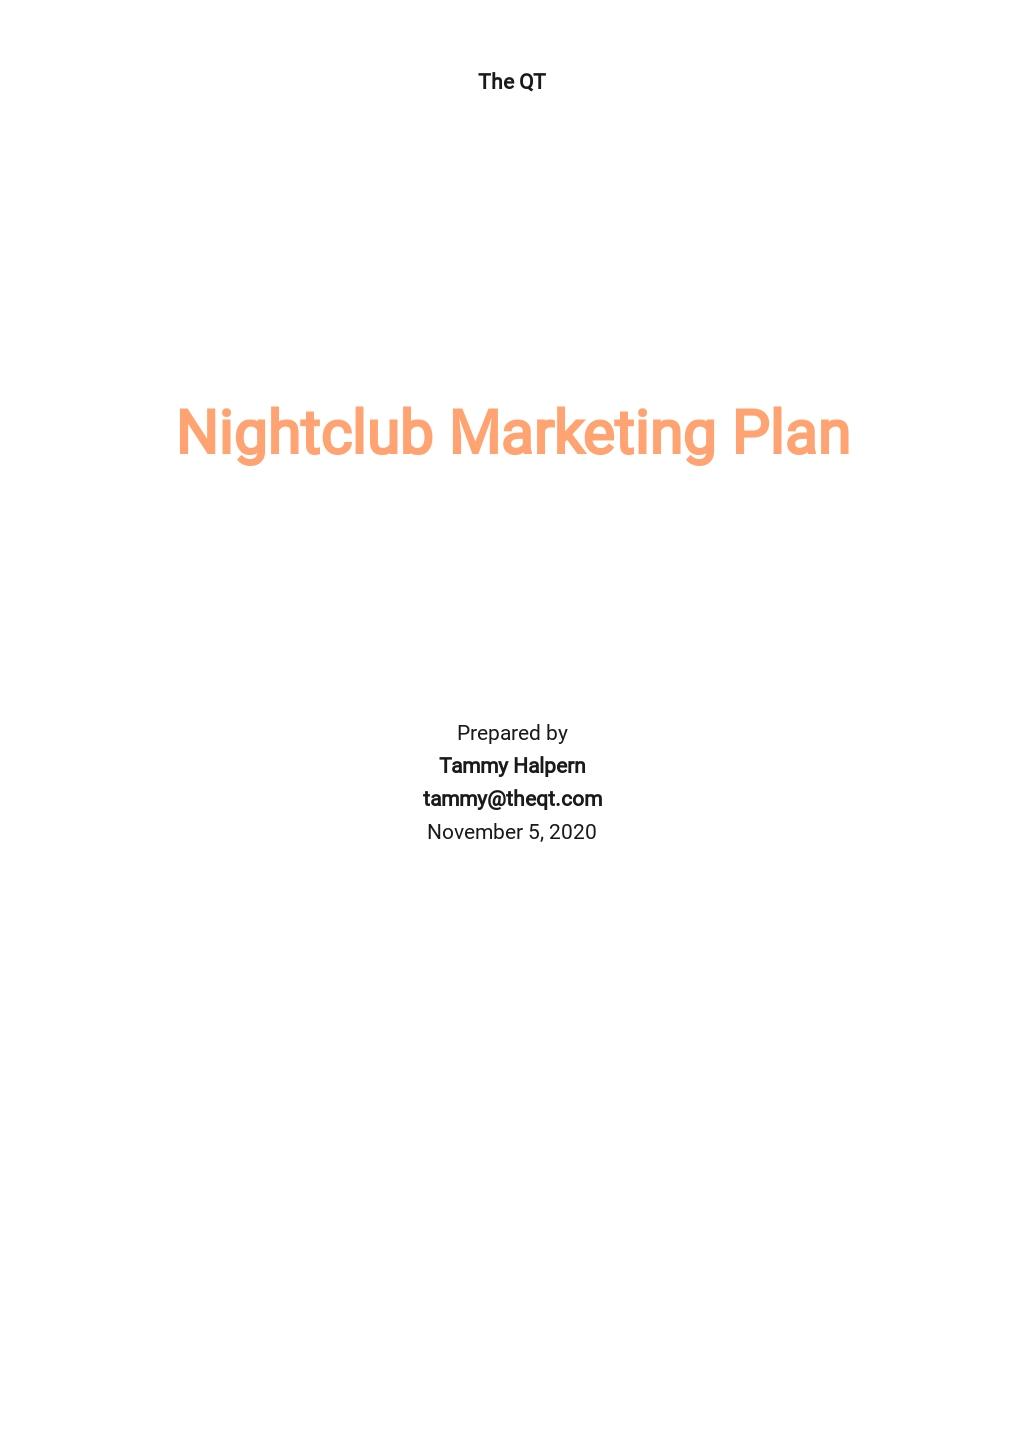 Nightclub Marketing Plan Template